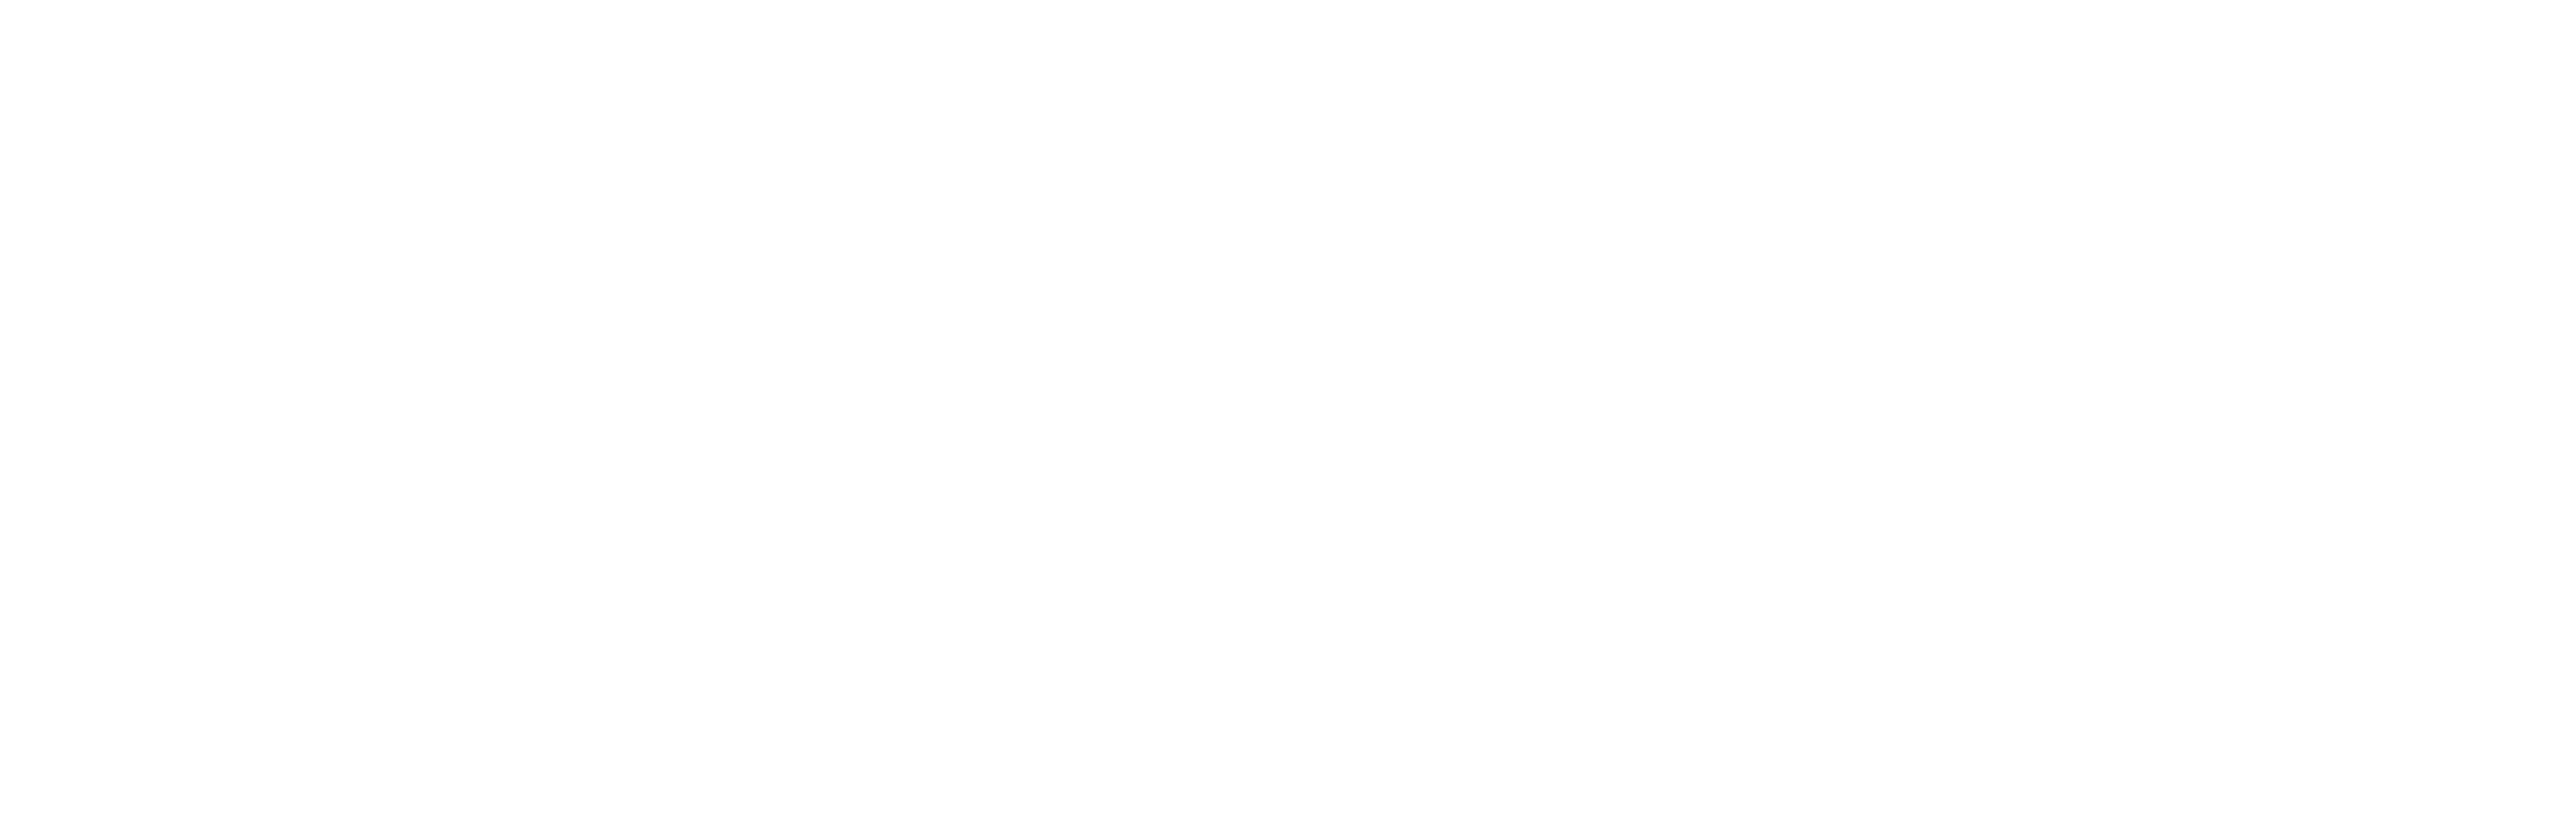 Bjarke Underskrift